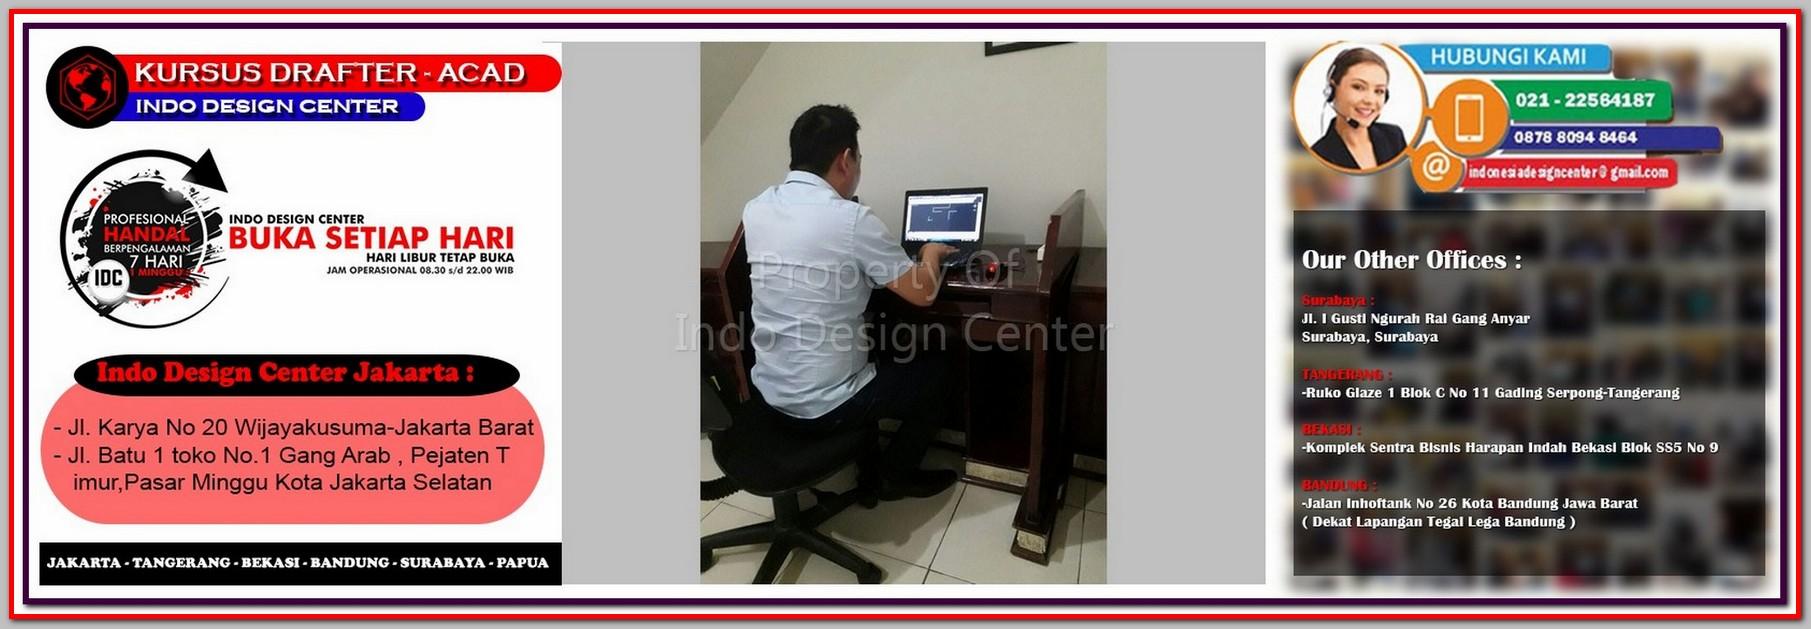 Kursus Arsitek Di Kebon Melati - Jakarta - Tangerang - Bekasi - Bandung - Surabaya